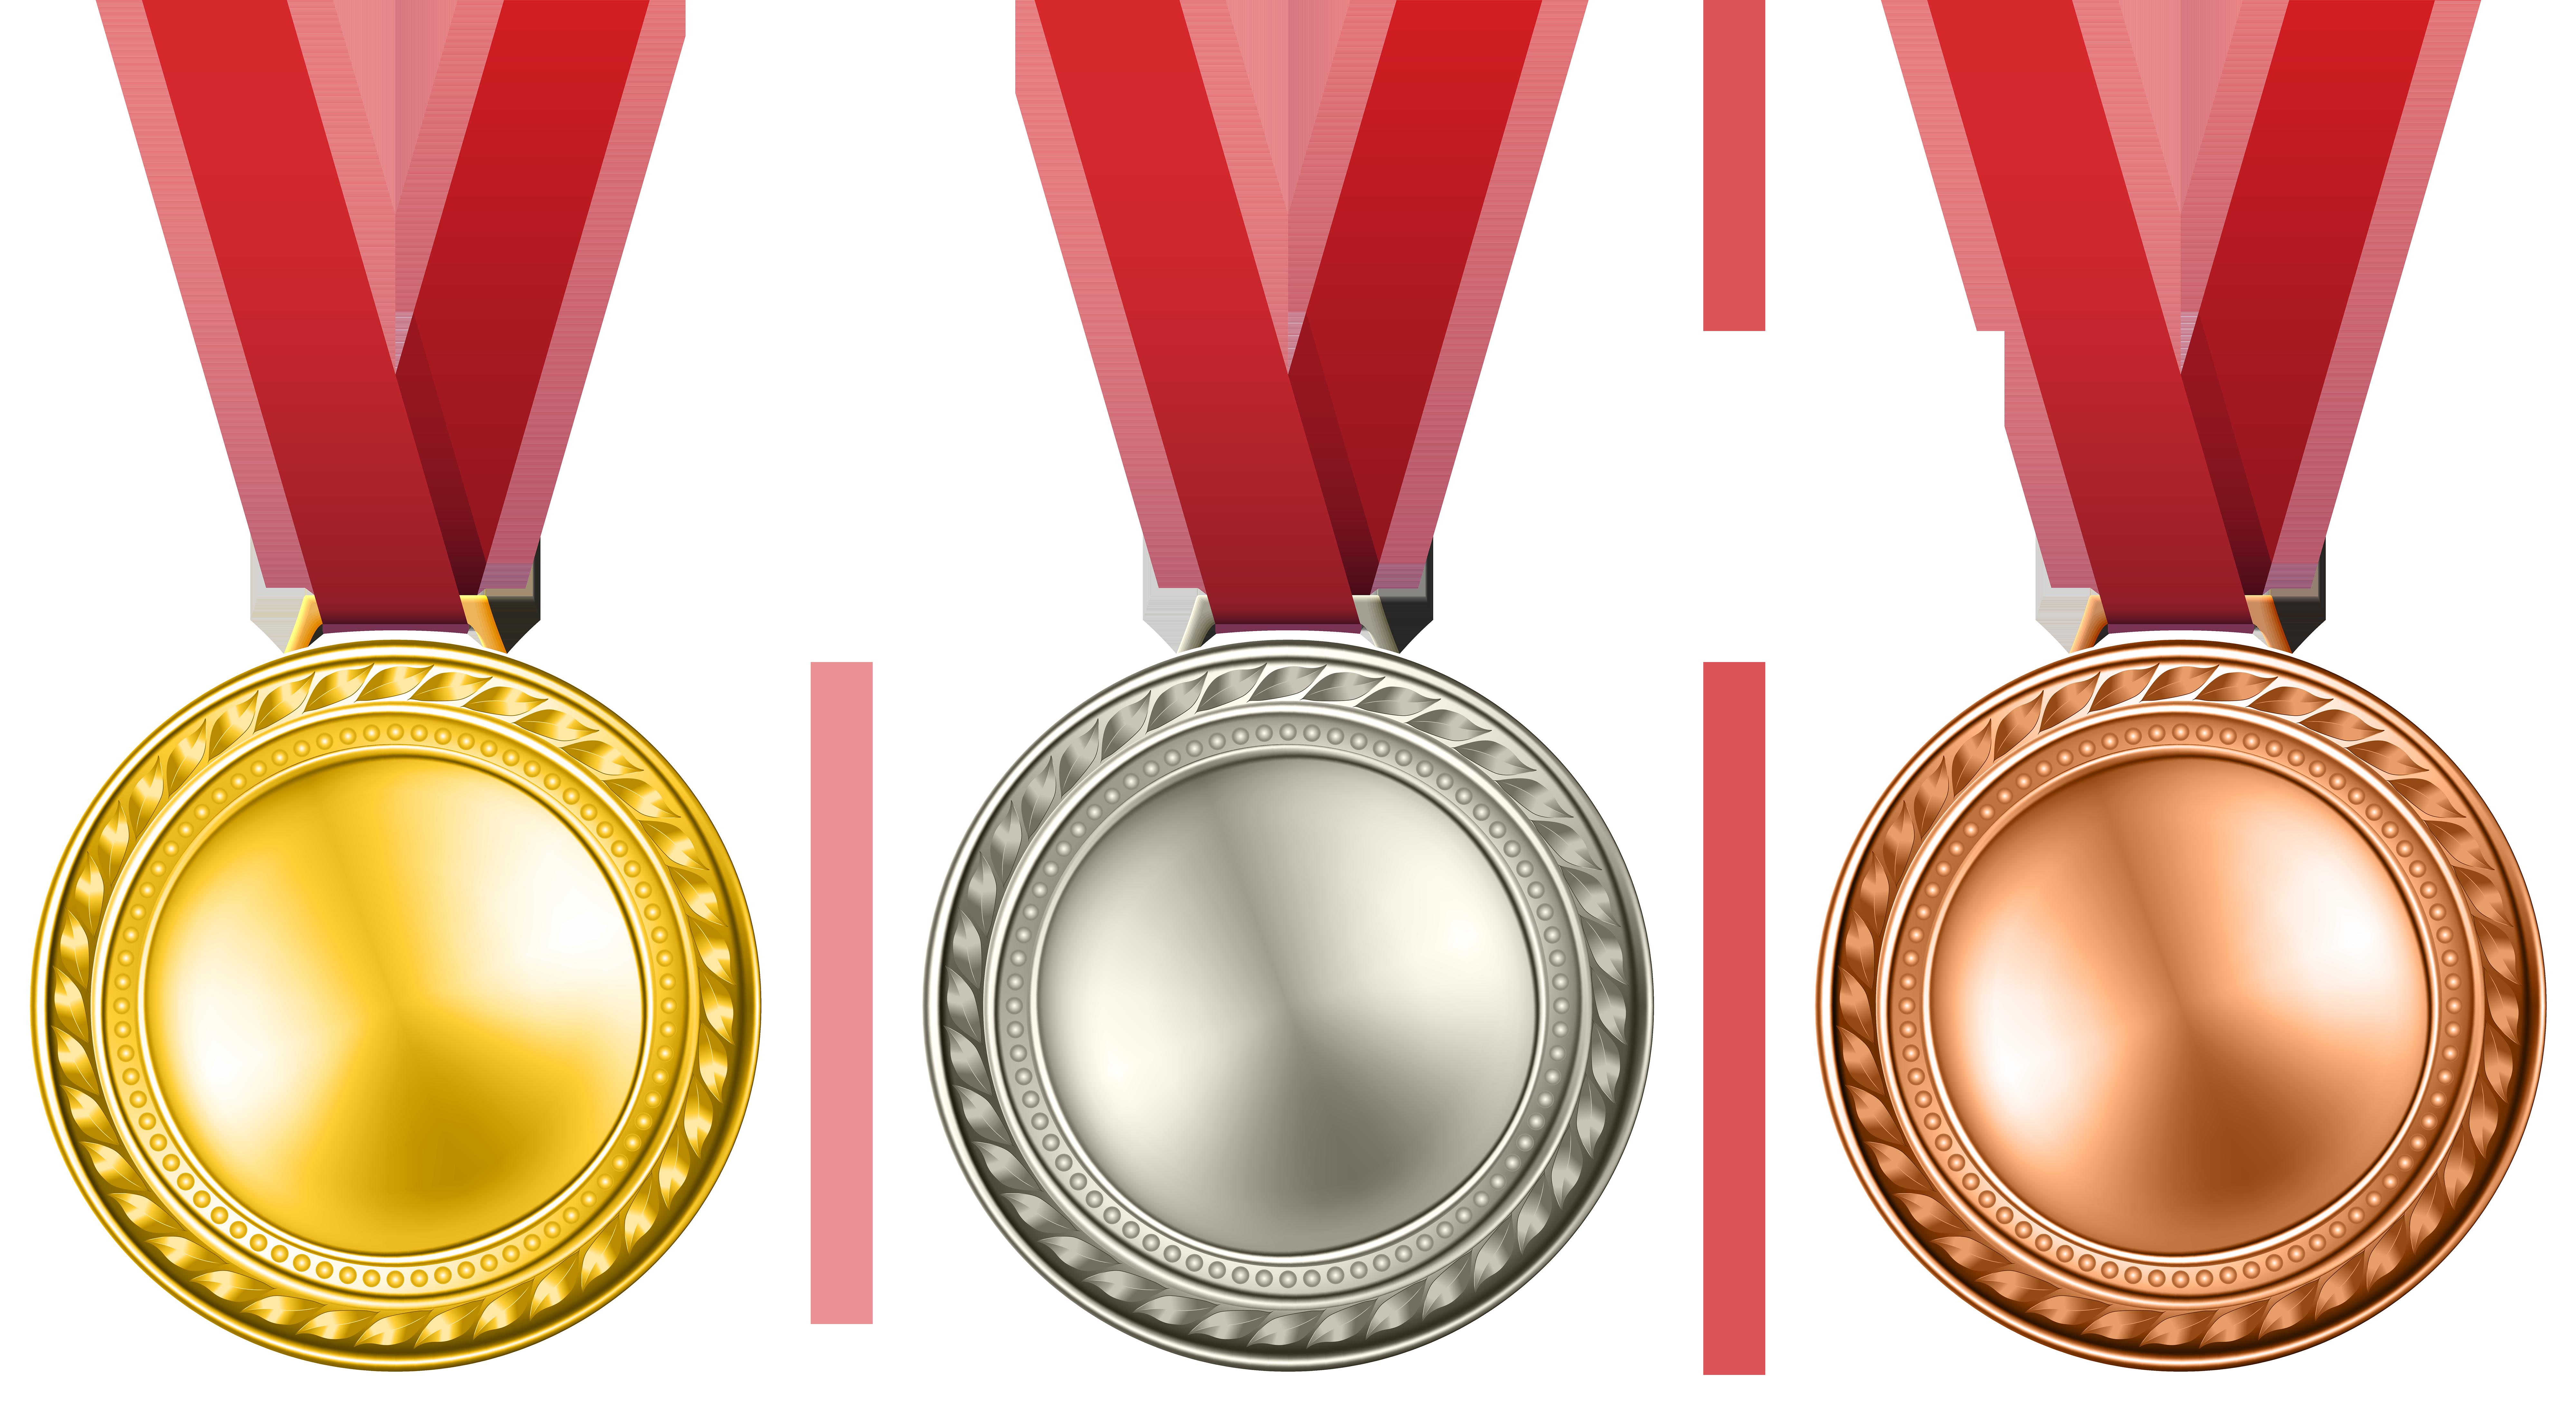 Olympics clipart gold medalist, Olympics gold medalist.